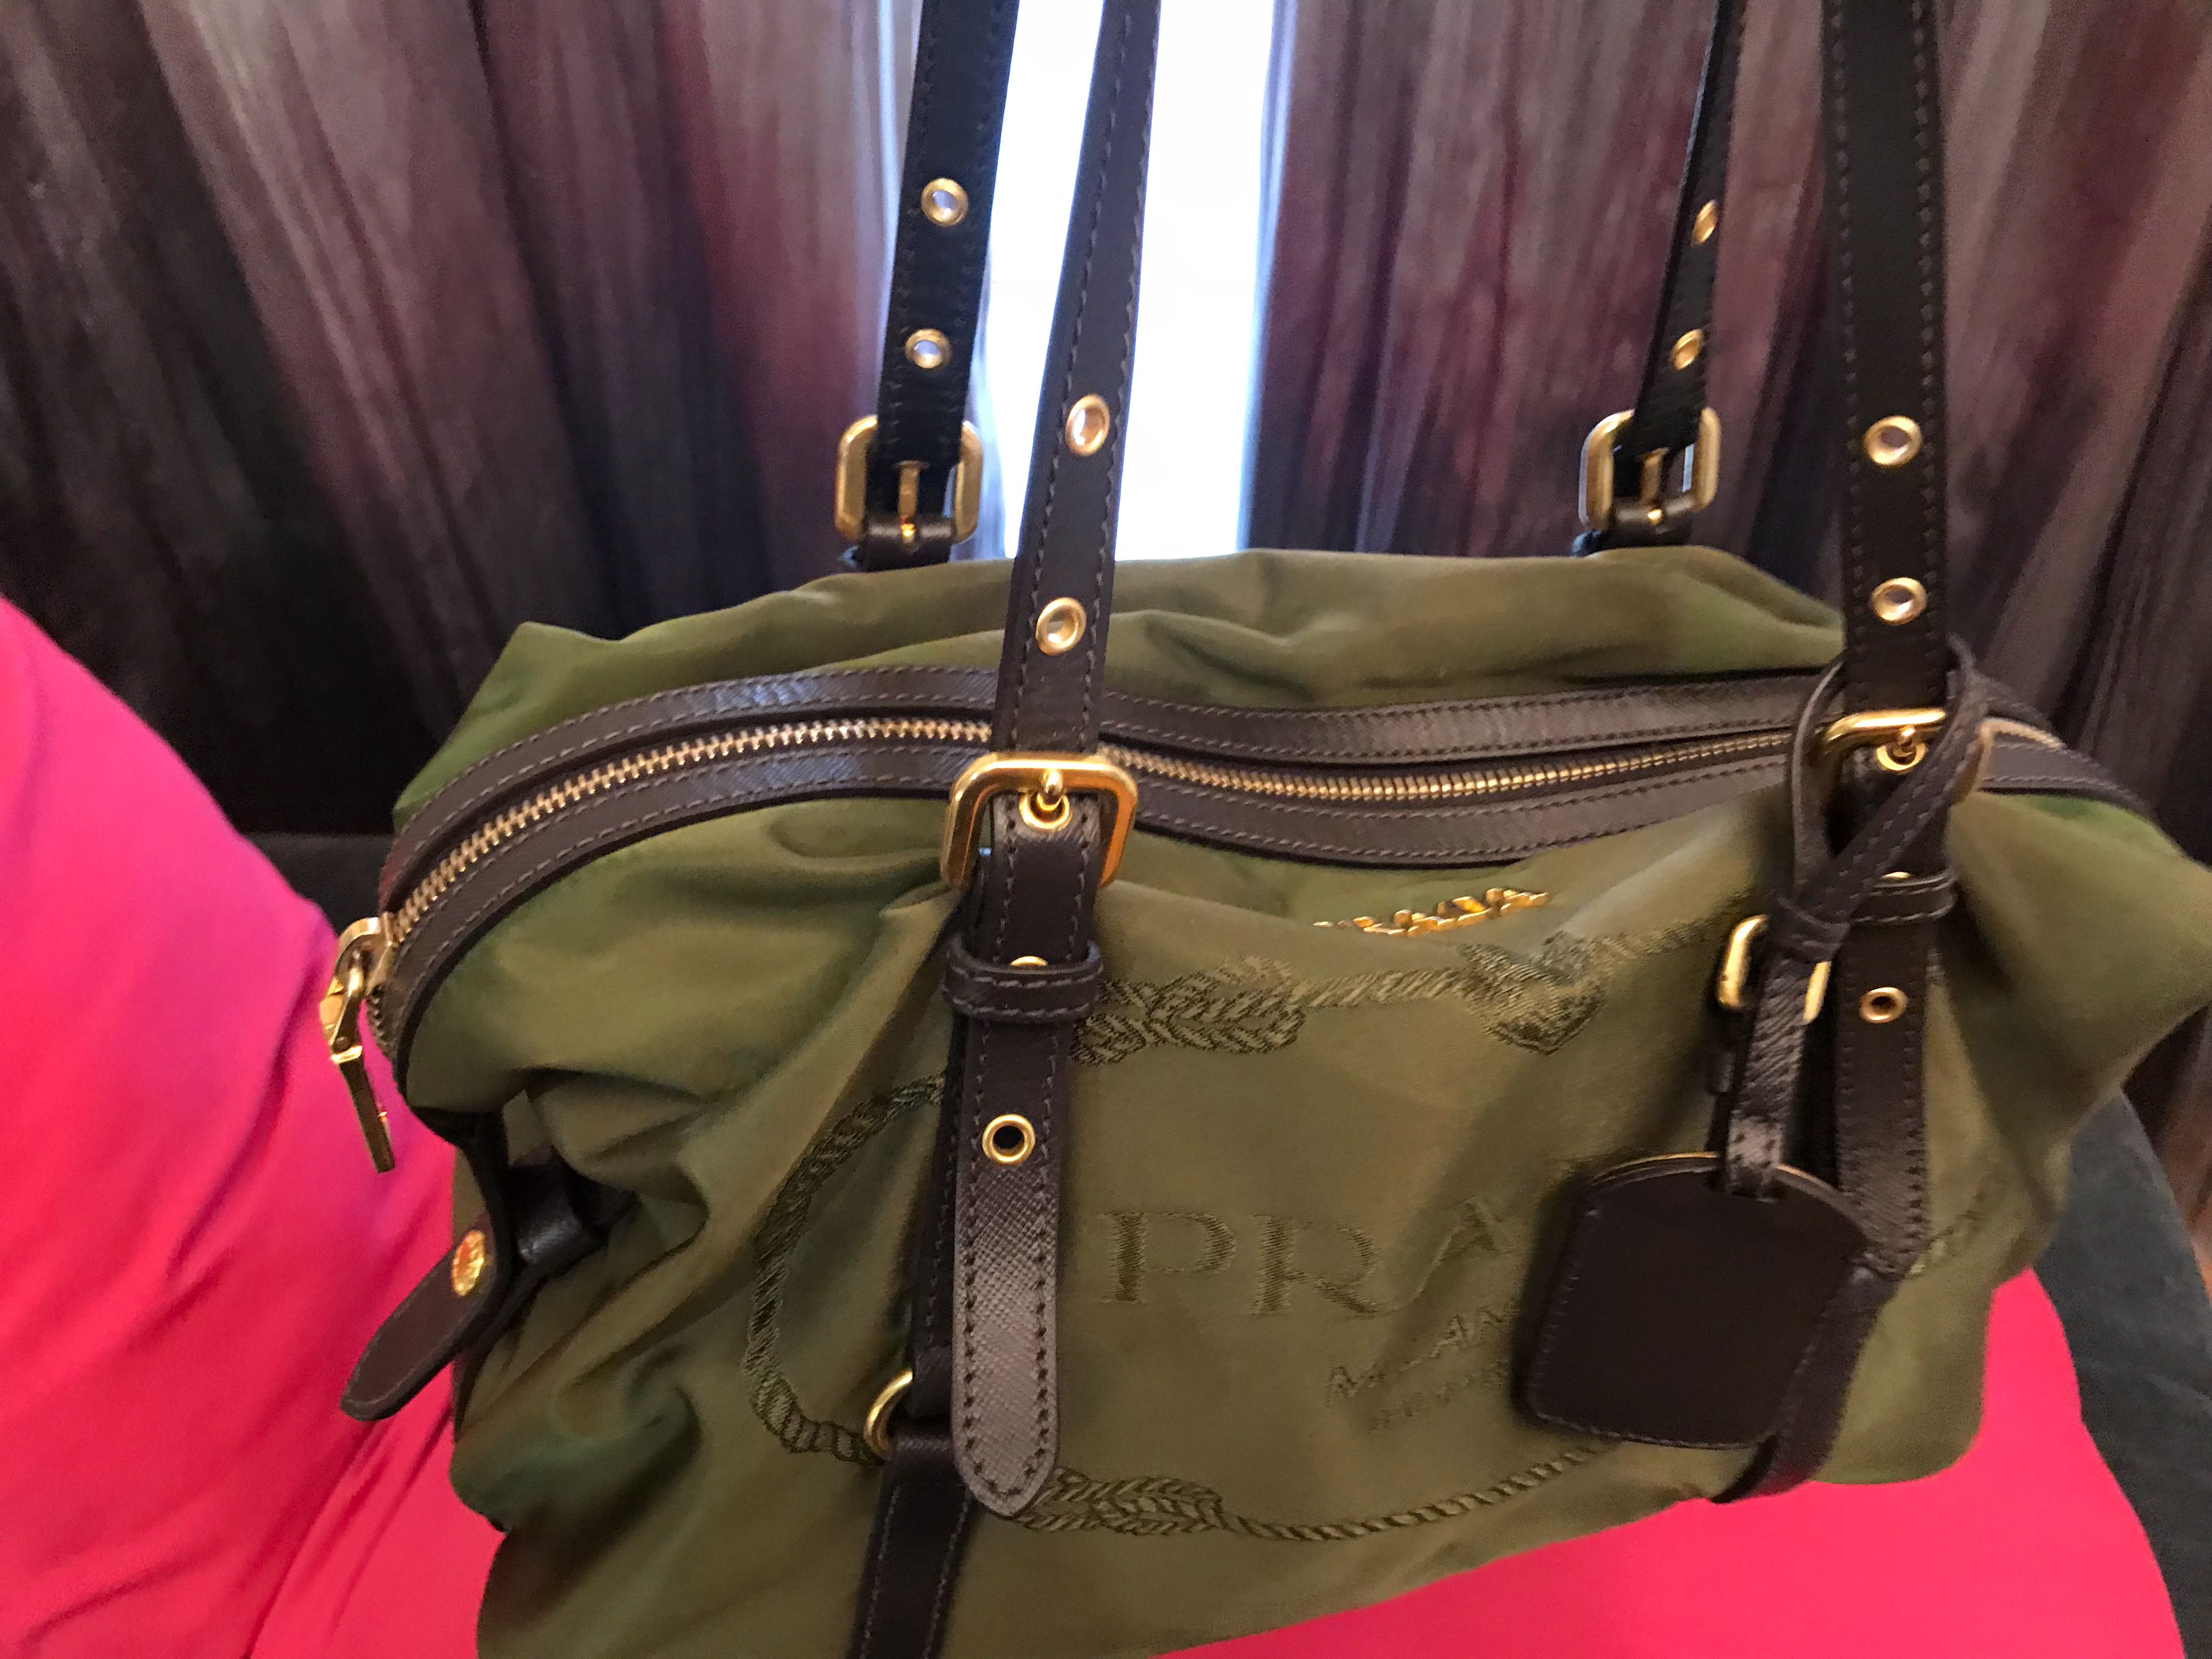 51f4084e00bb Authentic Prada Shoulder Bag (olive green)